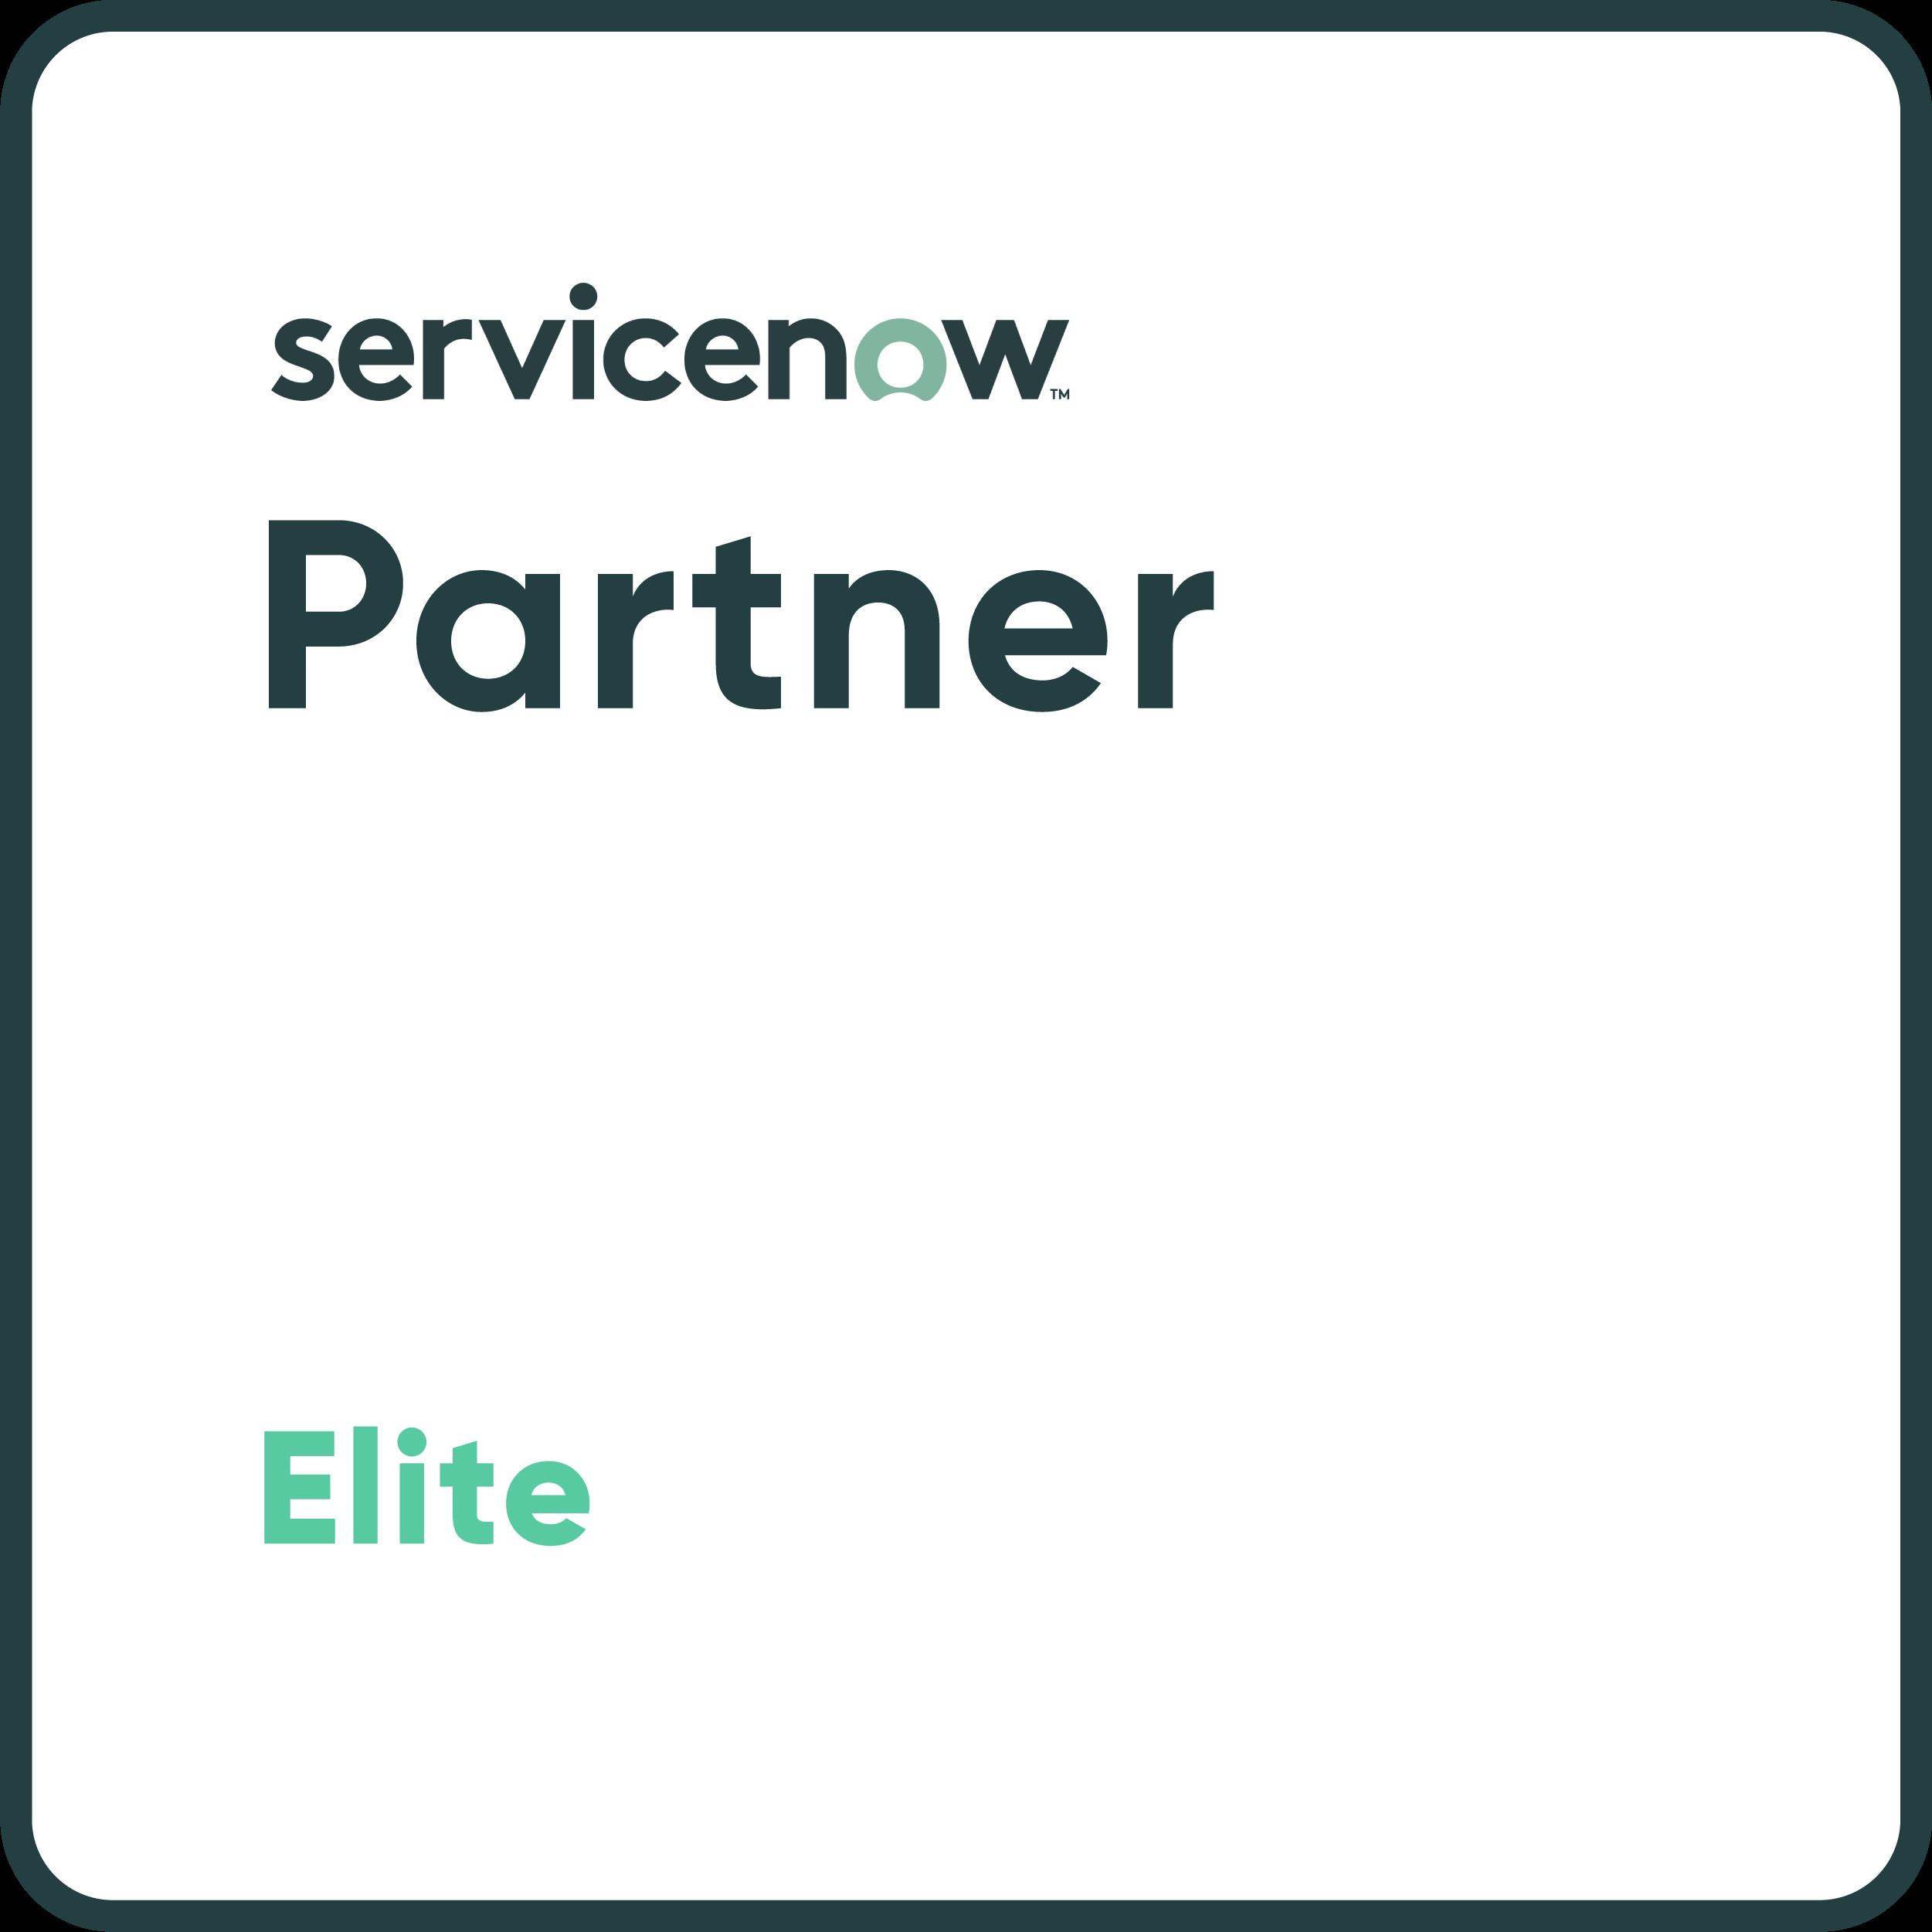 ServiceNow Elite Partner White